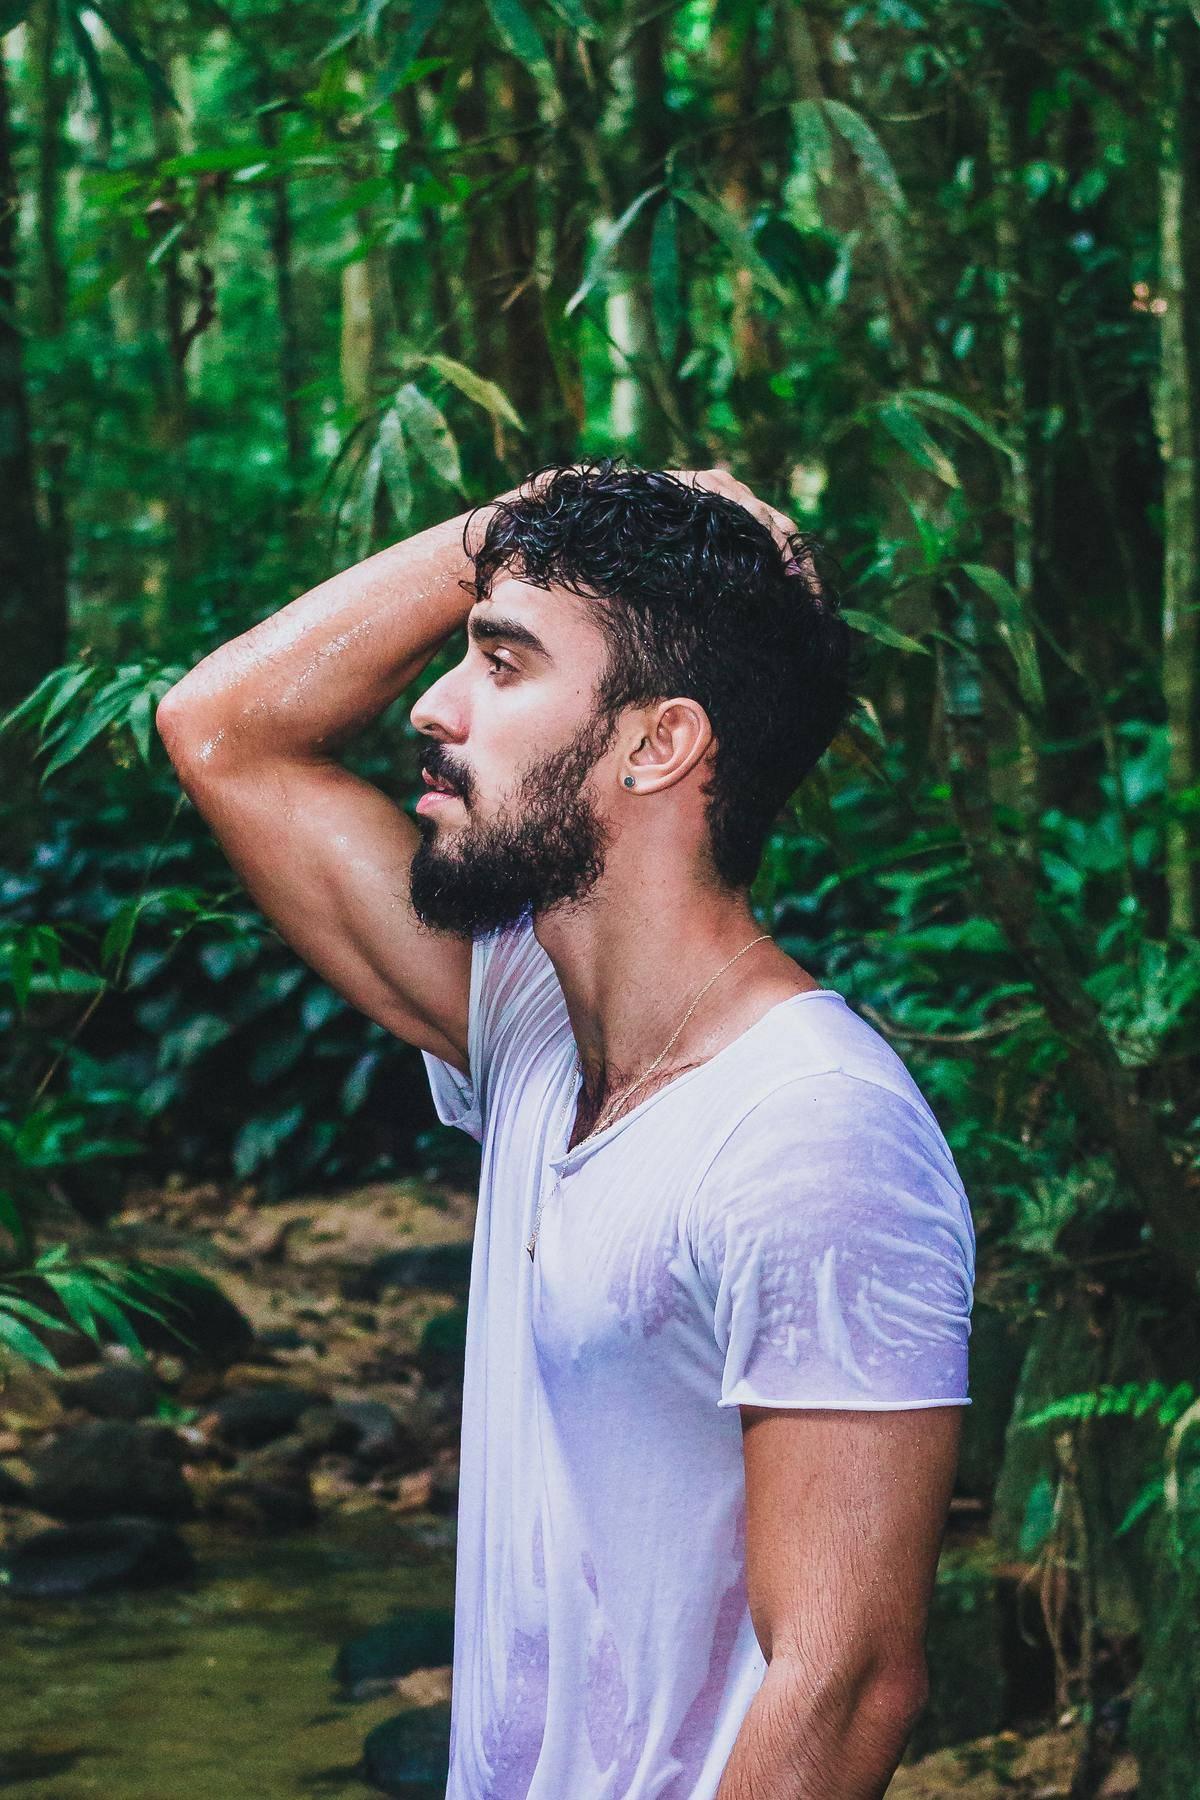 man in sweaty shirt in jungle